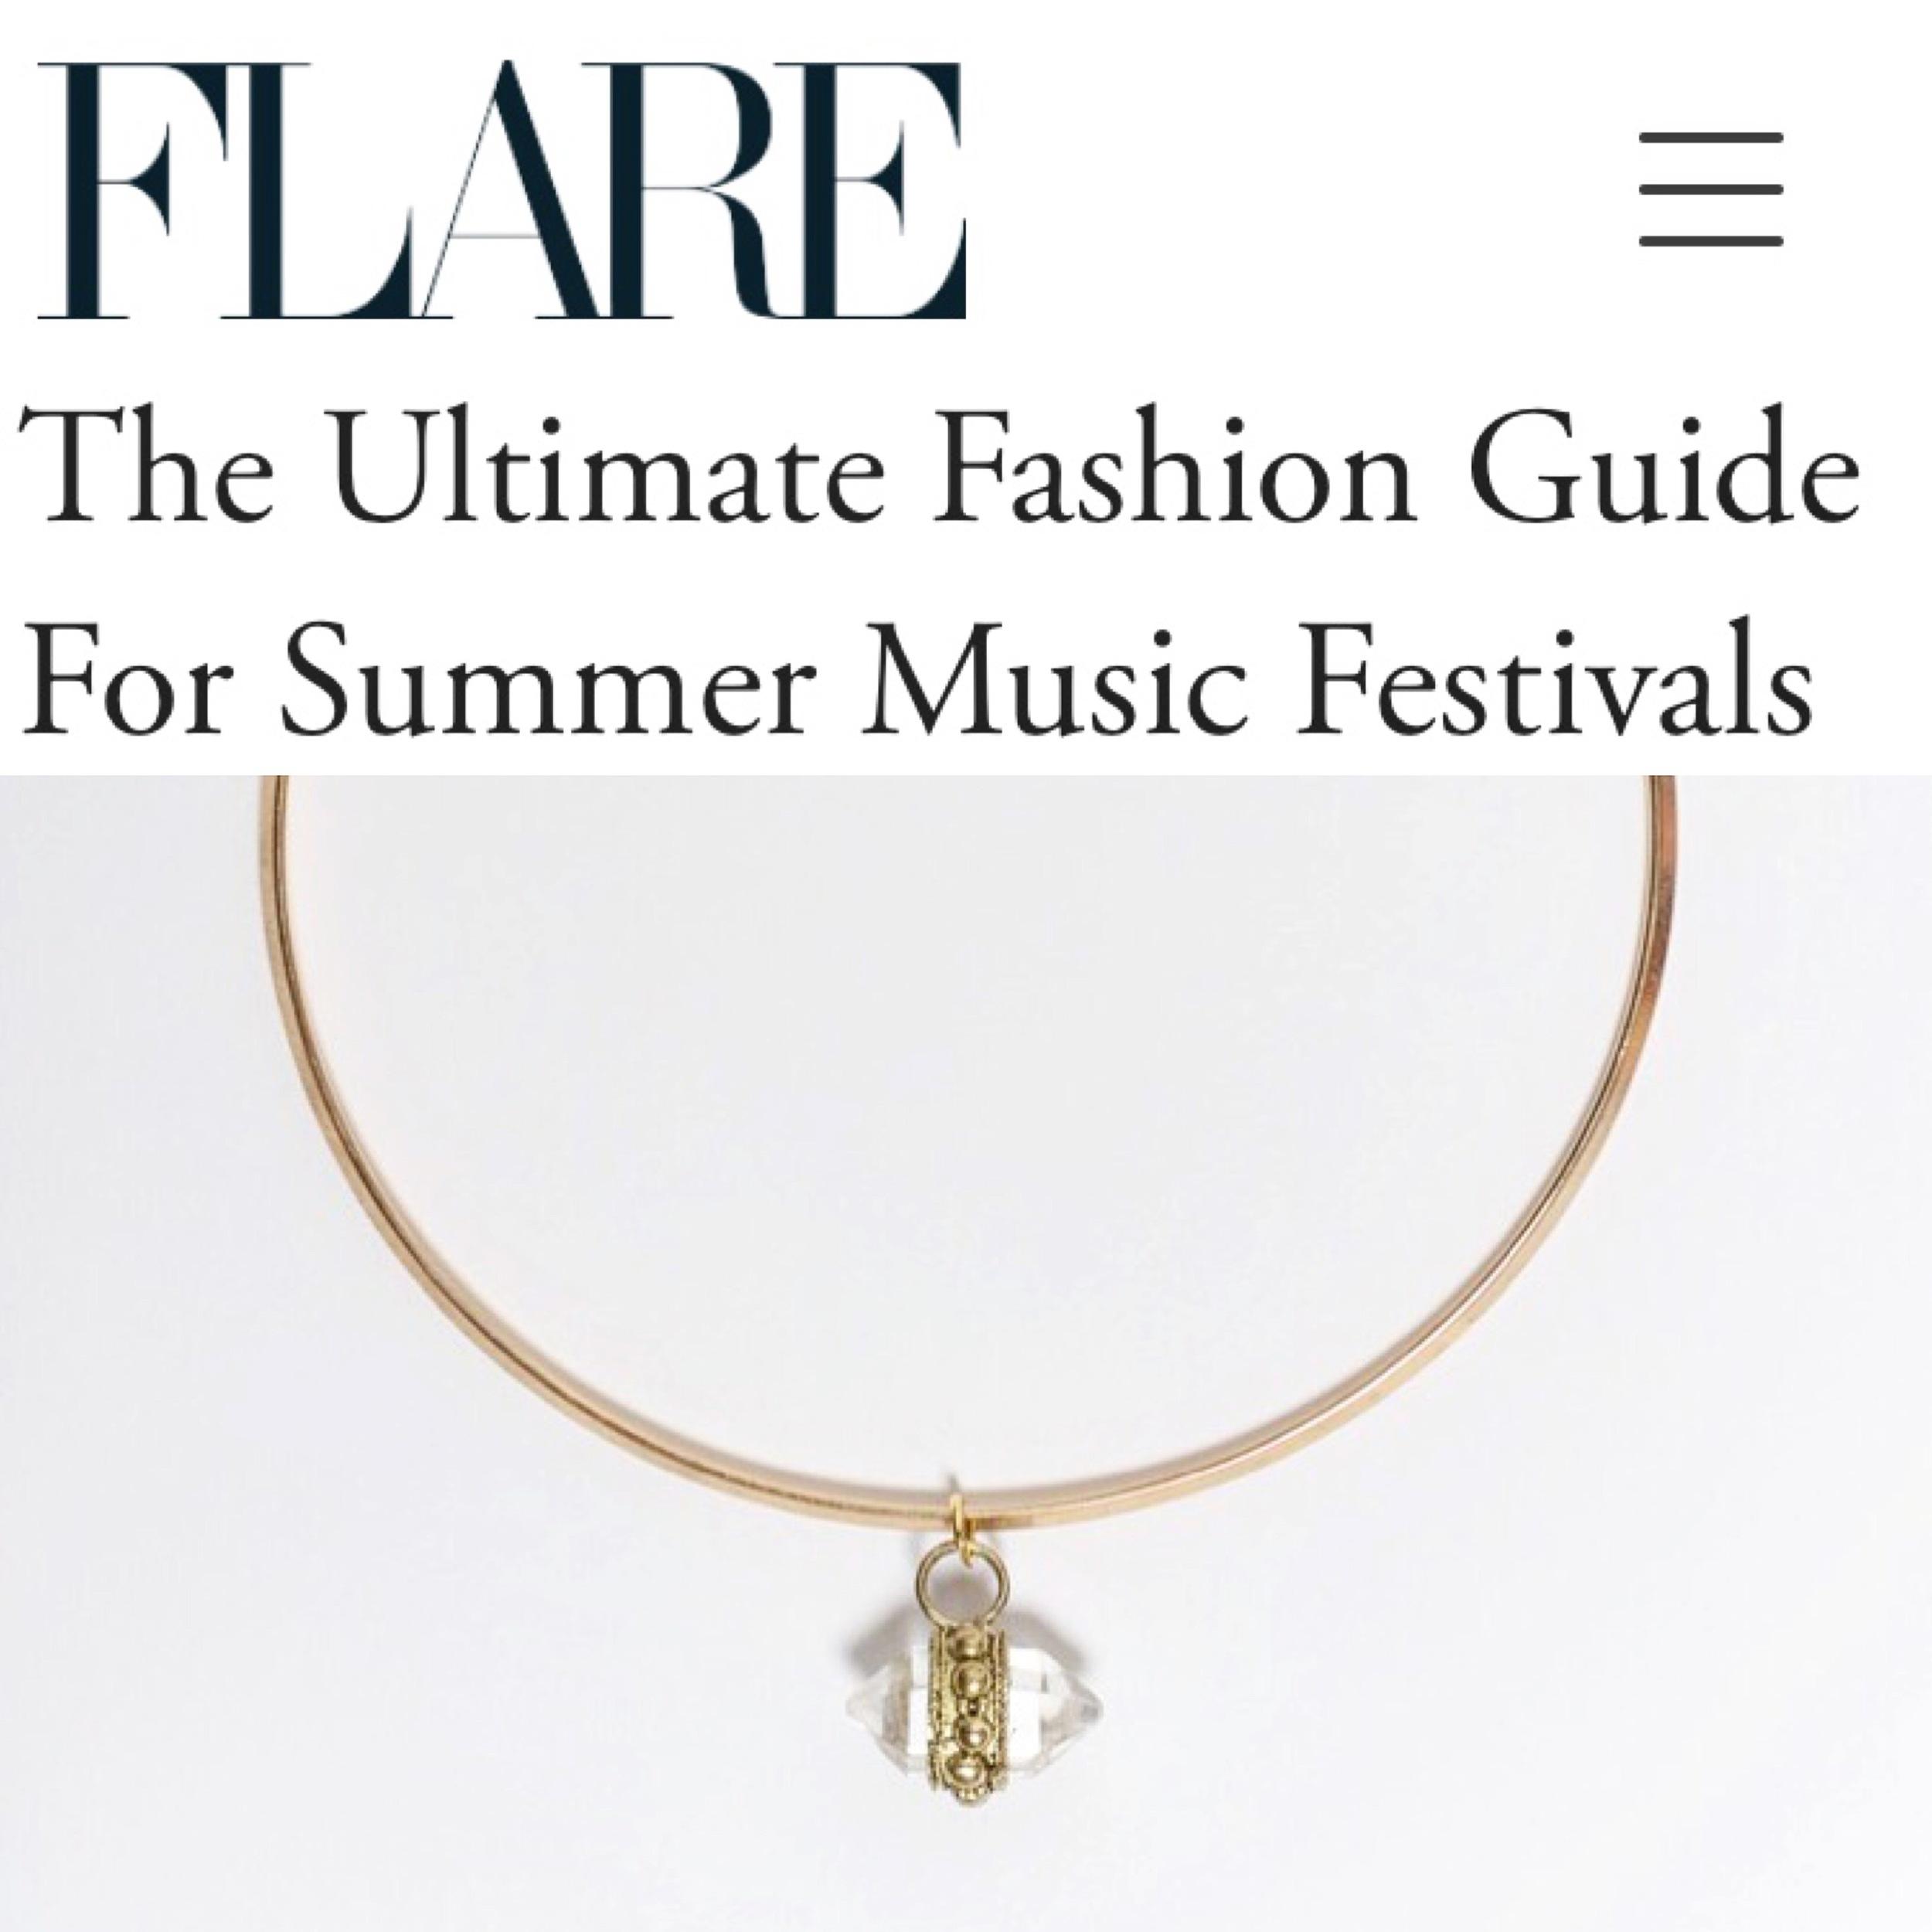 Dolorous Jewelry Crystal Choker Flare Magazine.JPG